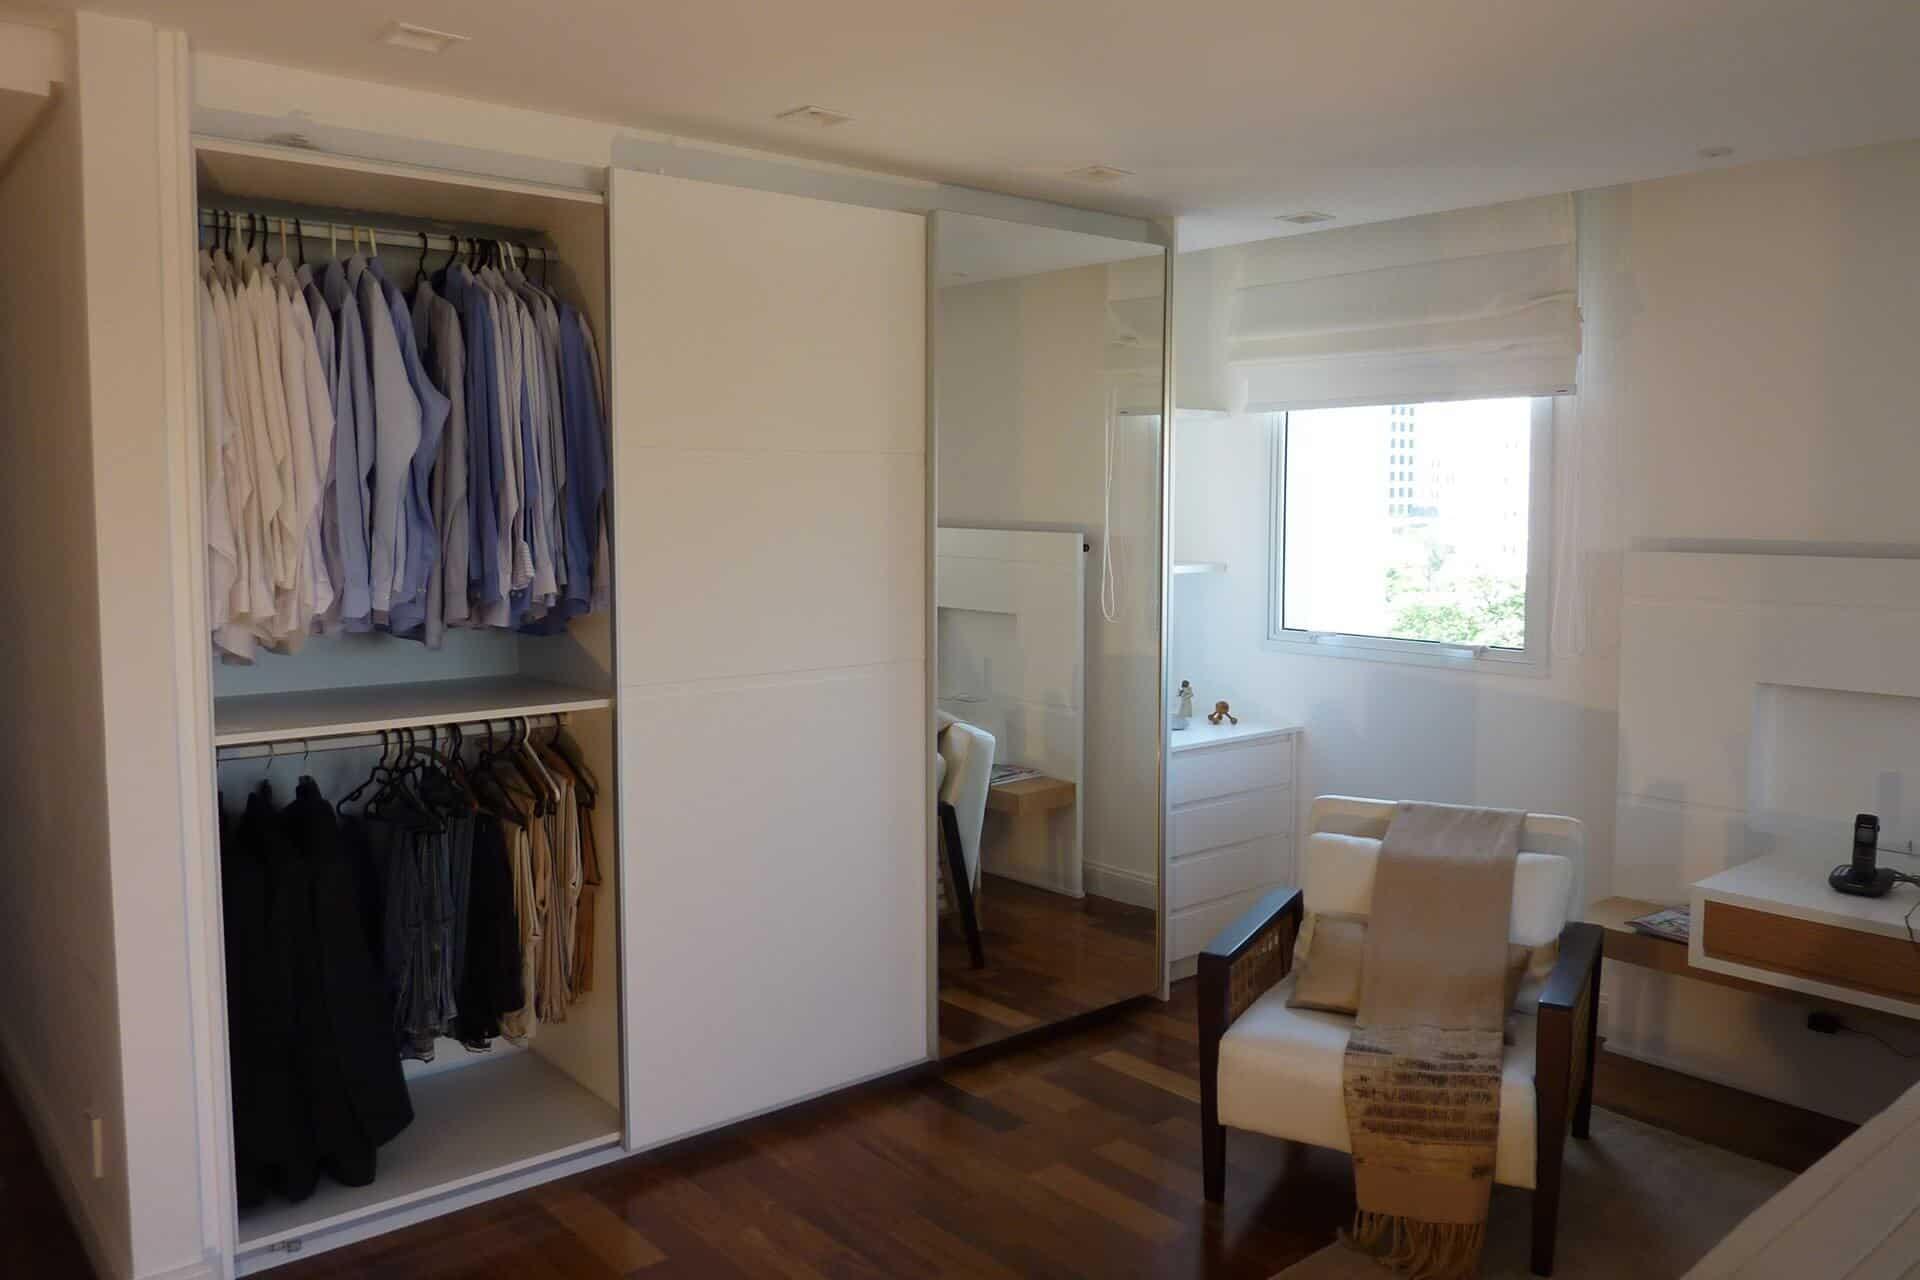 dormitorio-planejado_moveis-sob-medida-galeria-165